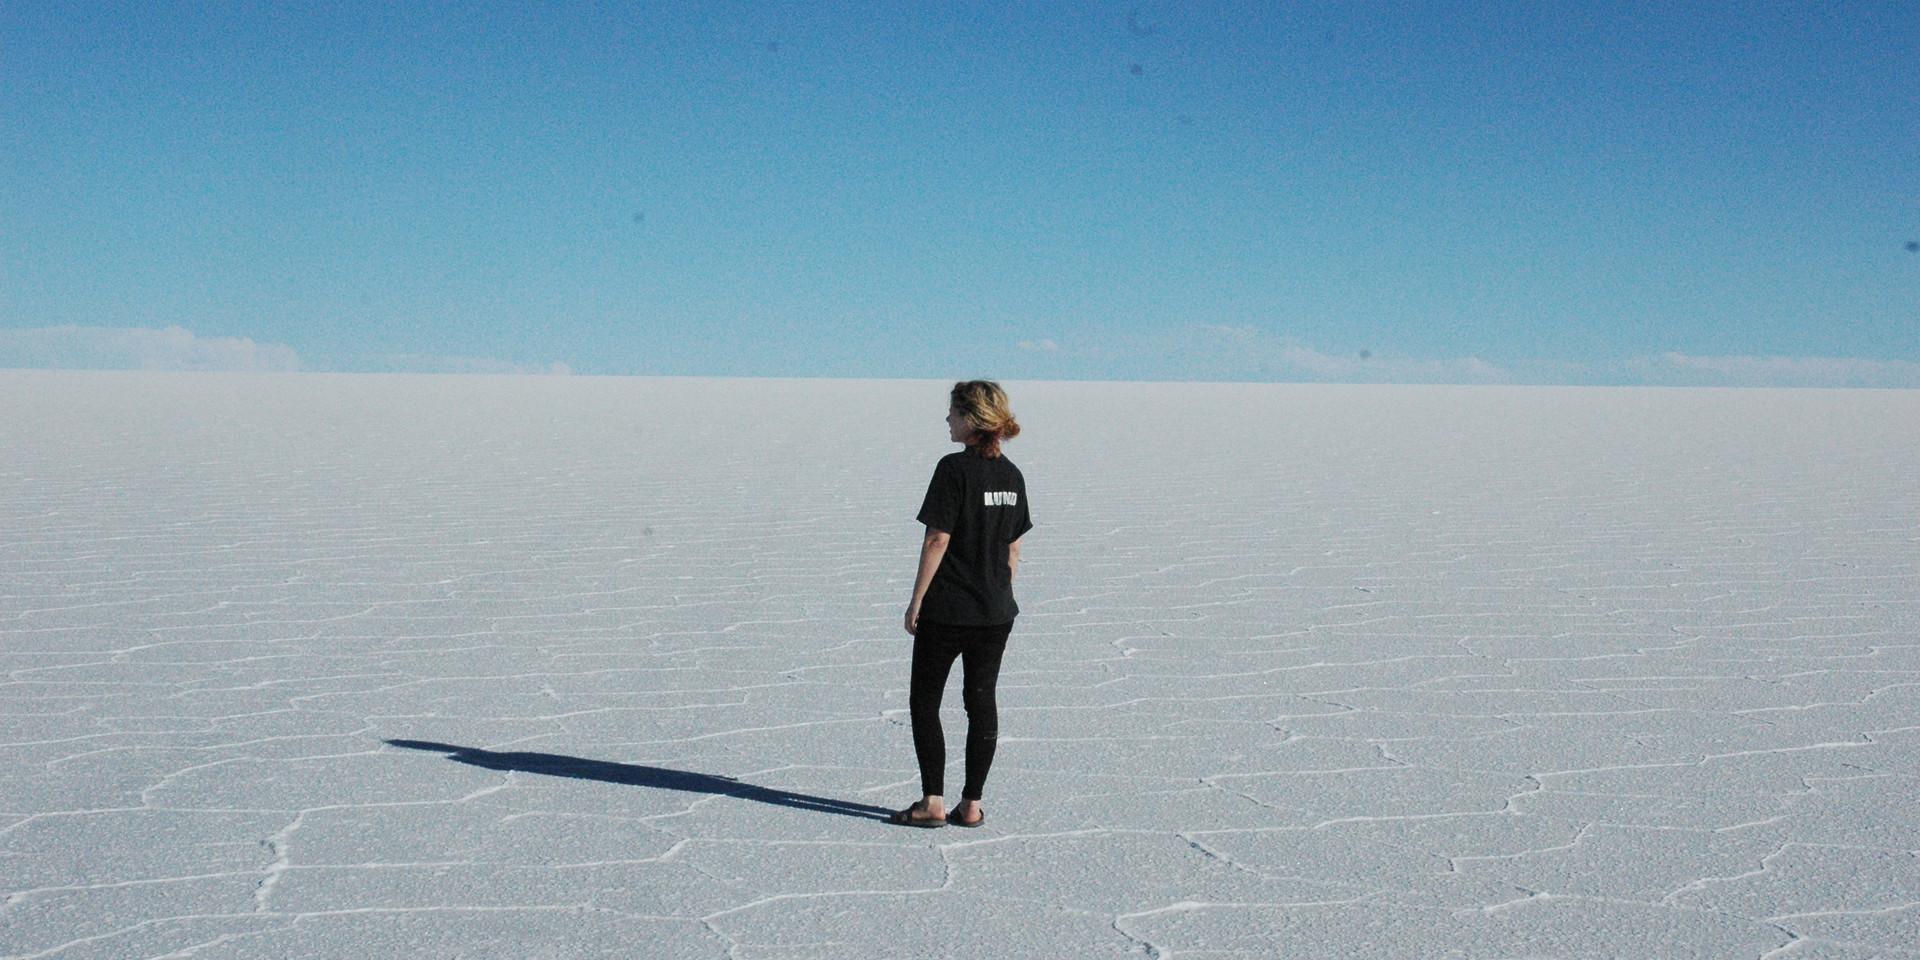 The Salt Desert of Uyuni